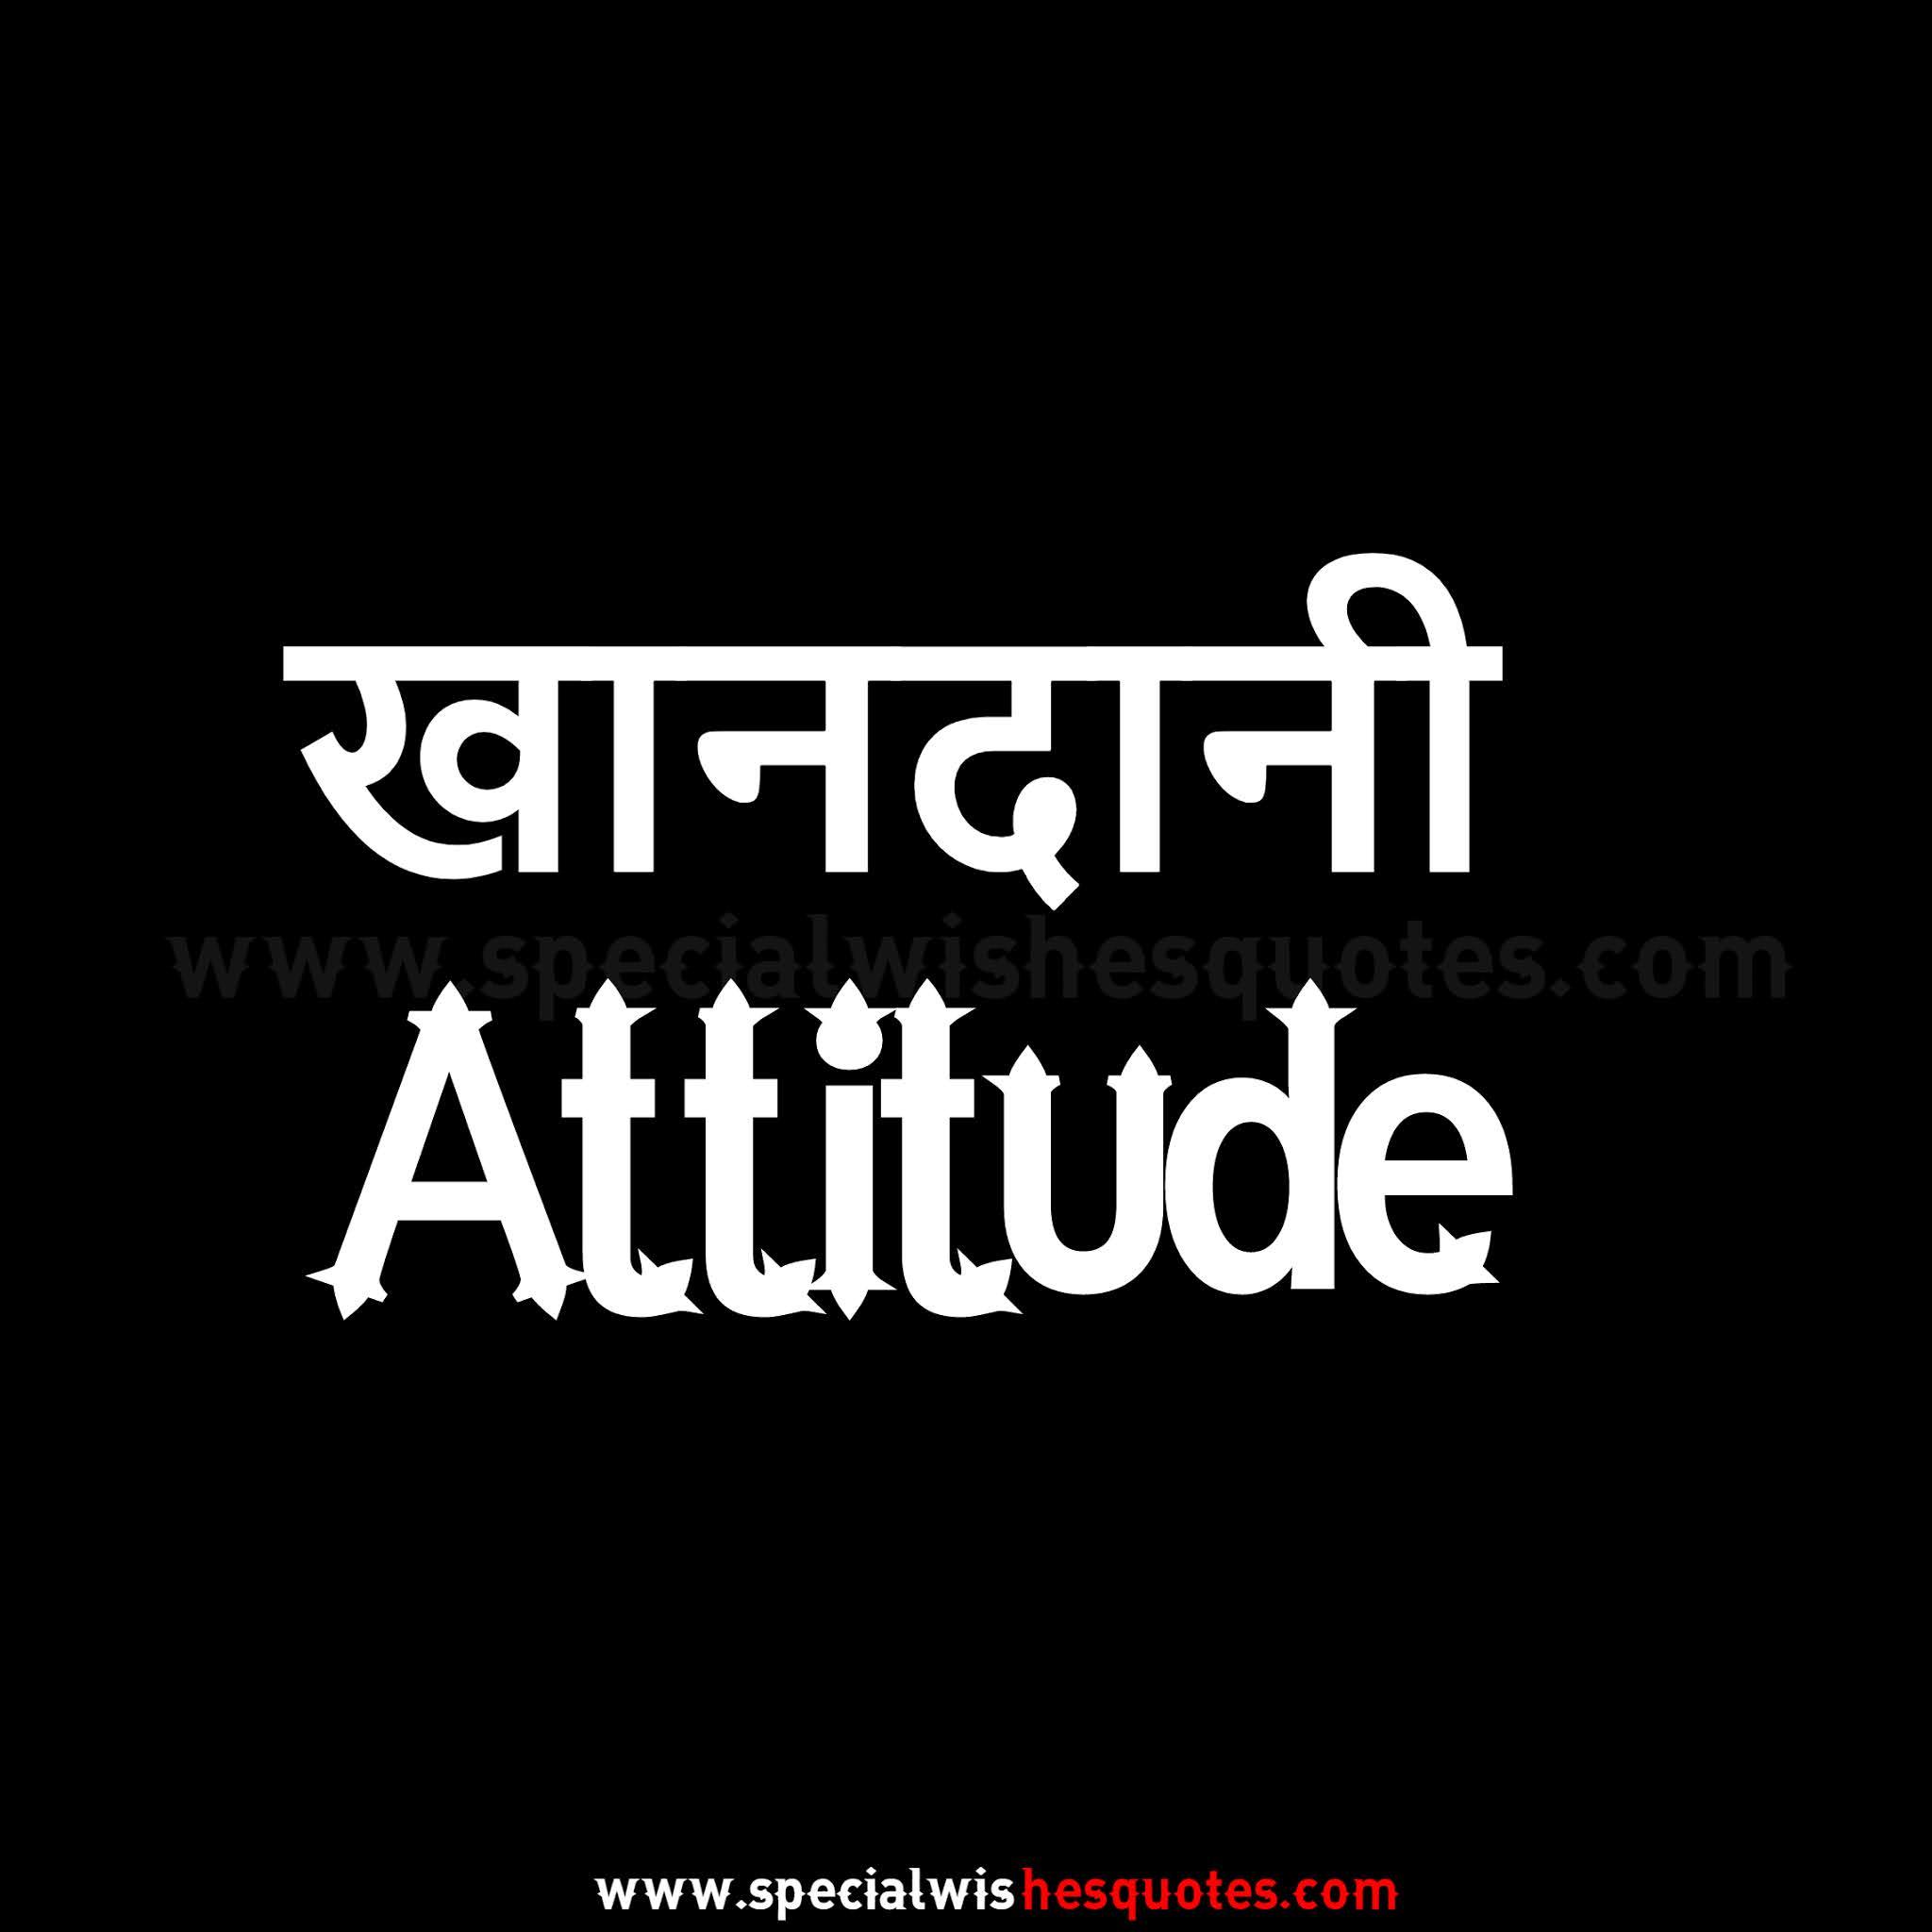 'Khandani Attitude Wali dp Whatsapp Ke Liye'